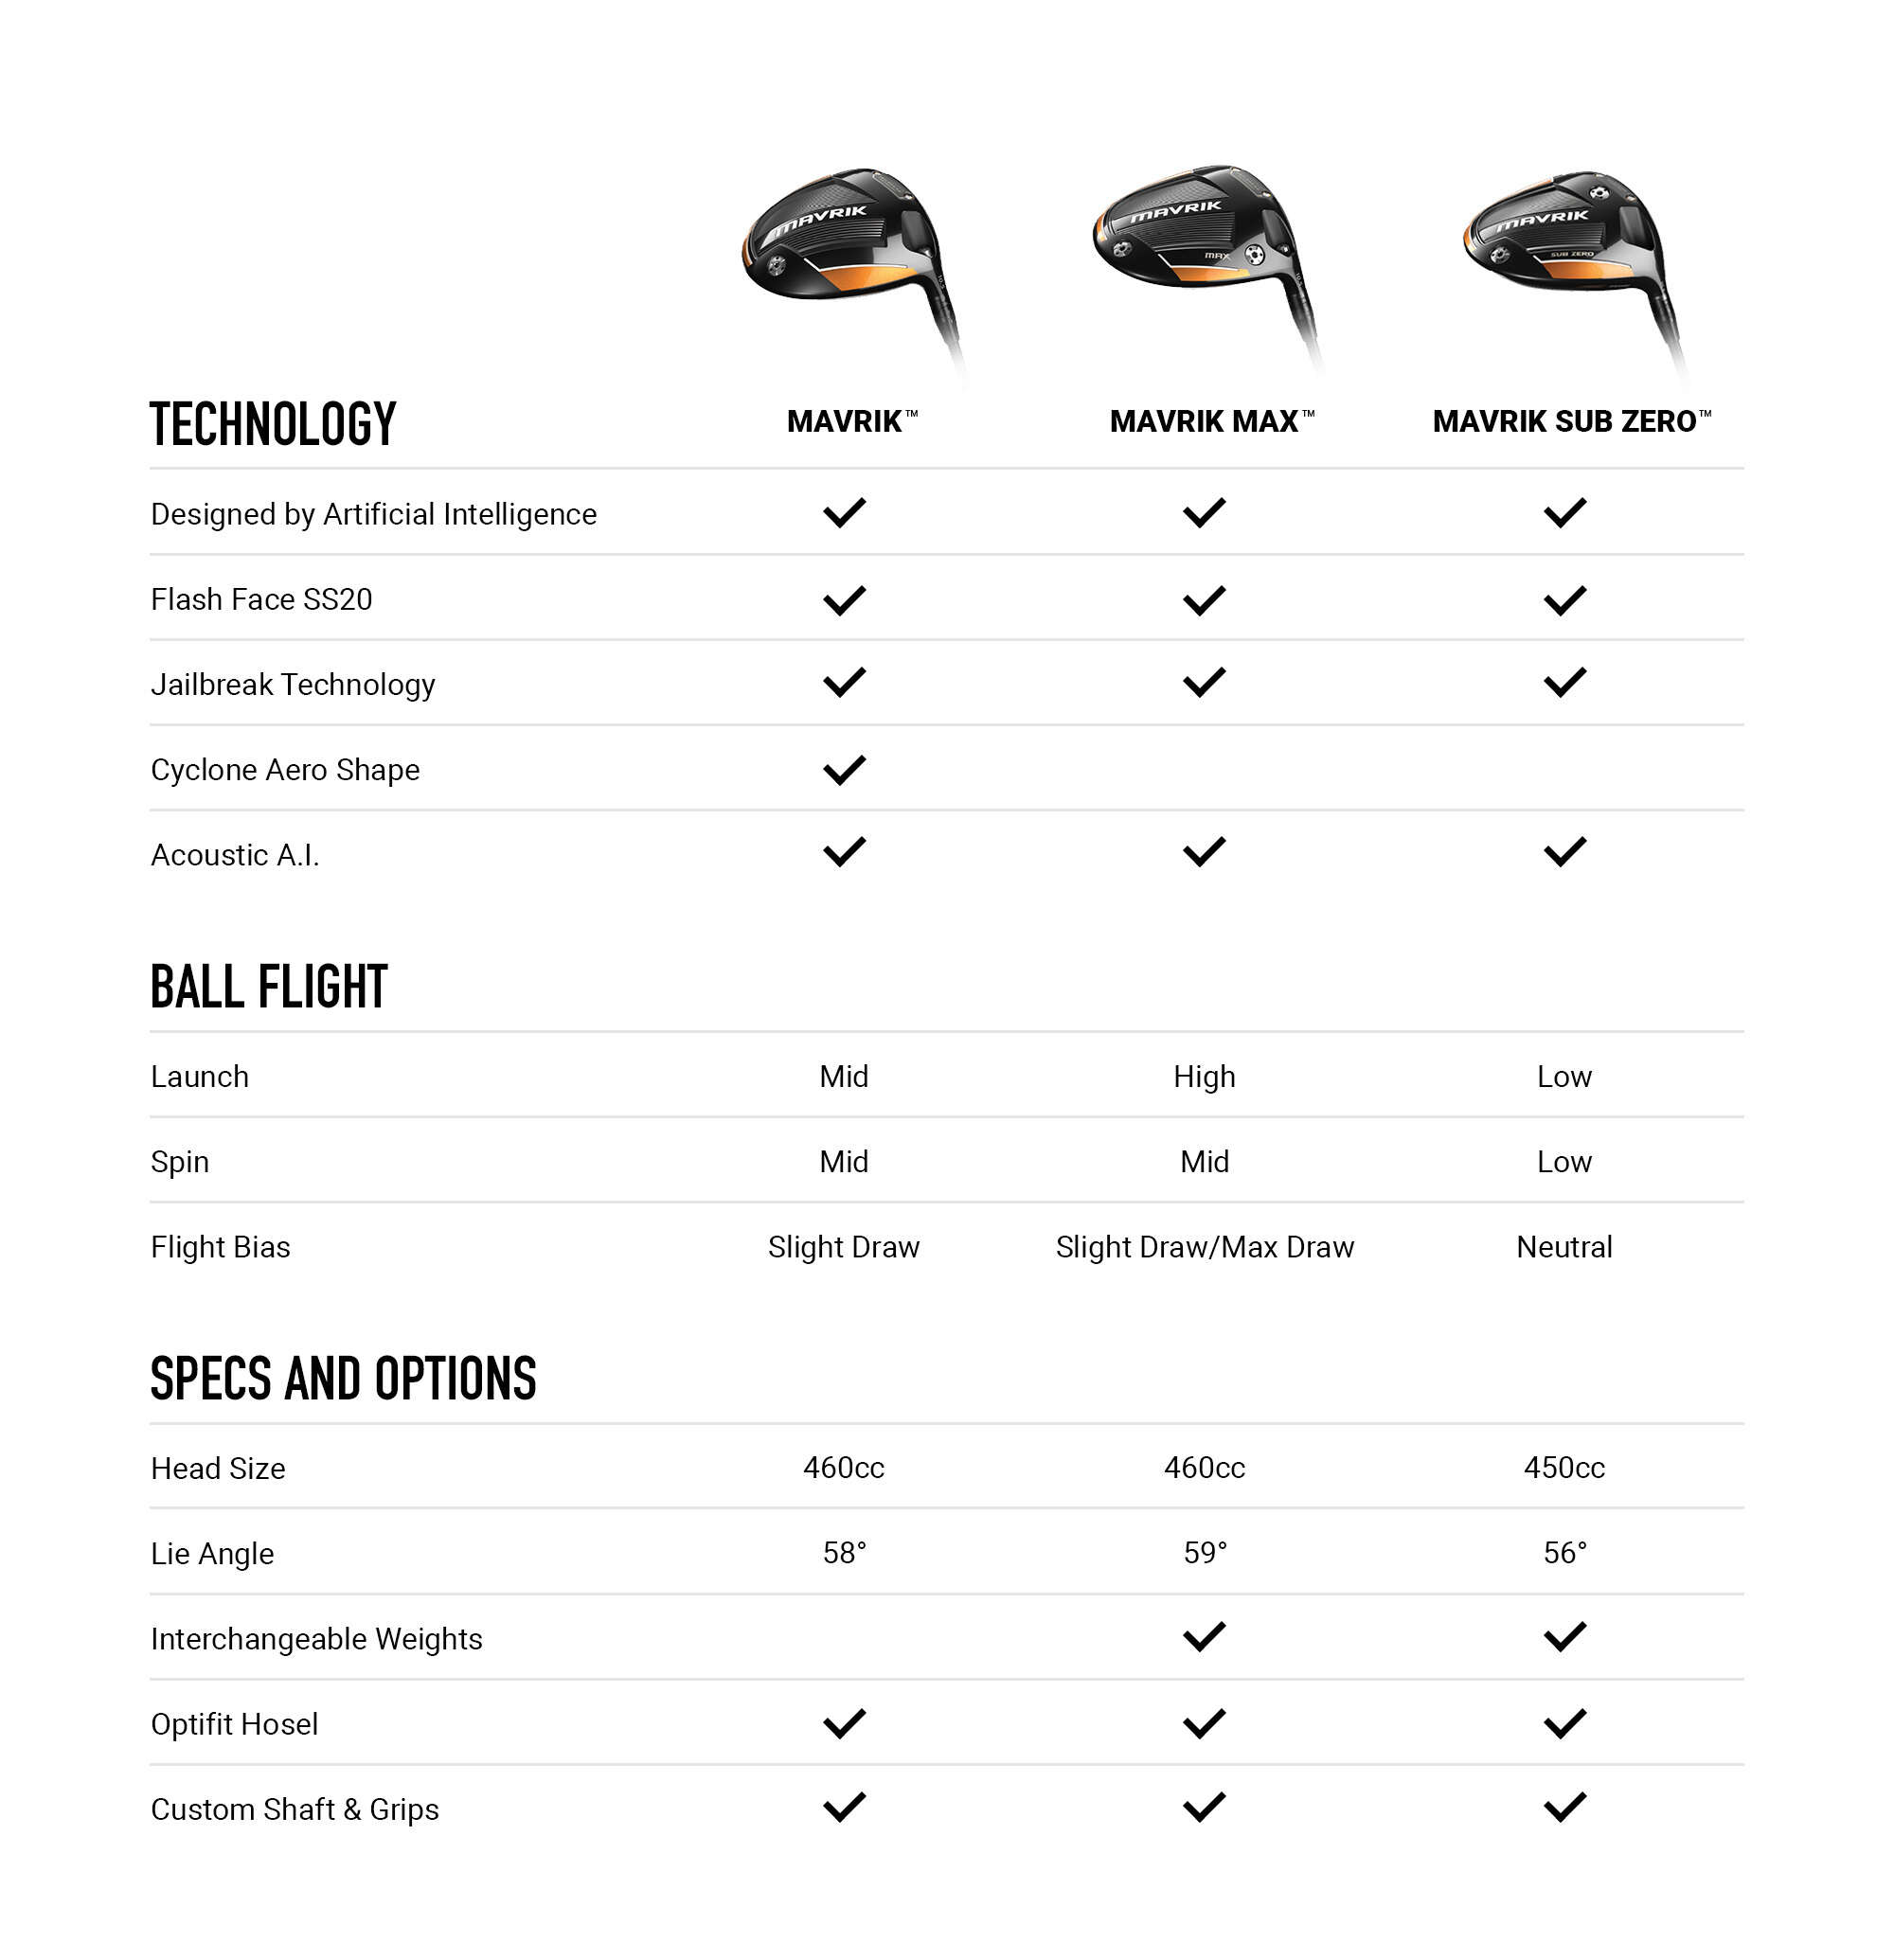 Callaway MAVRIK Driver Comparison Chart